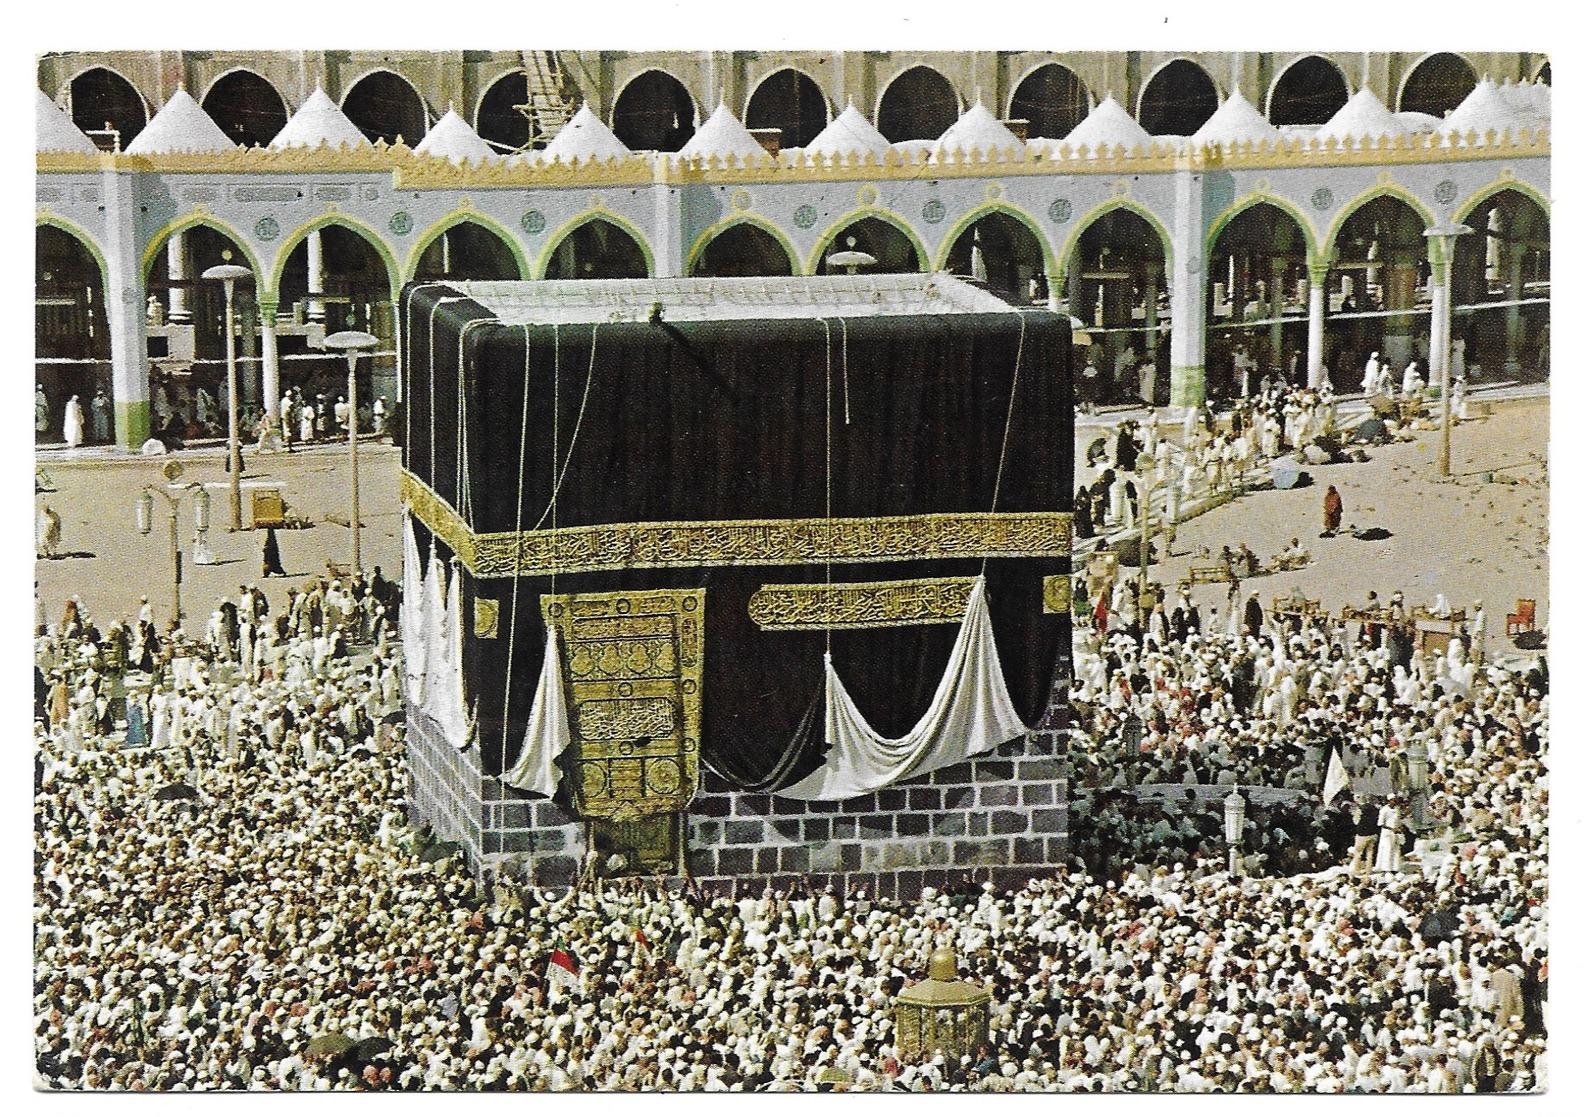 Arabie Saoudite La Mecque - Arabie Saoudite